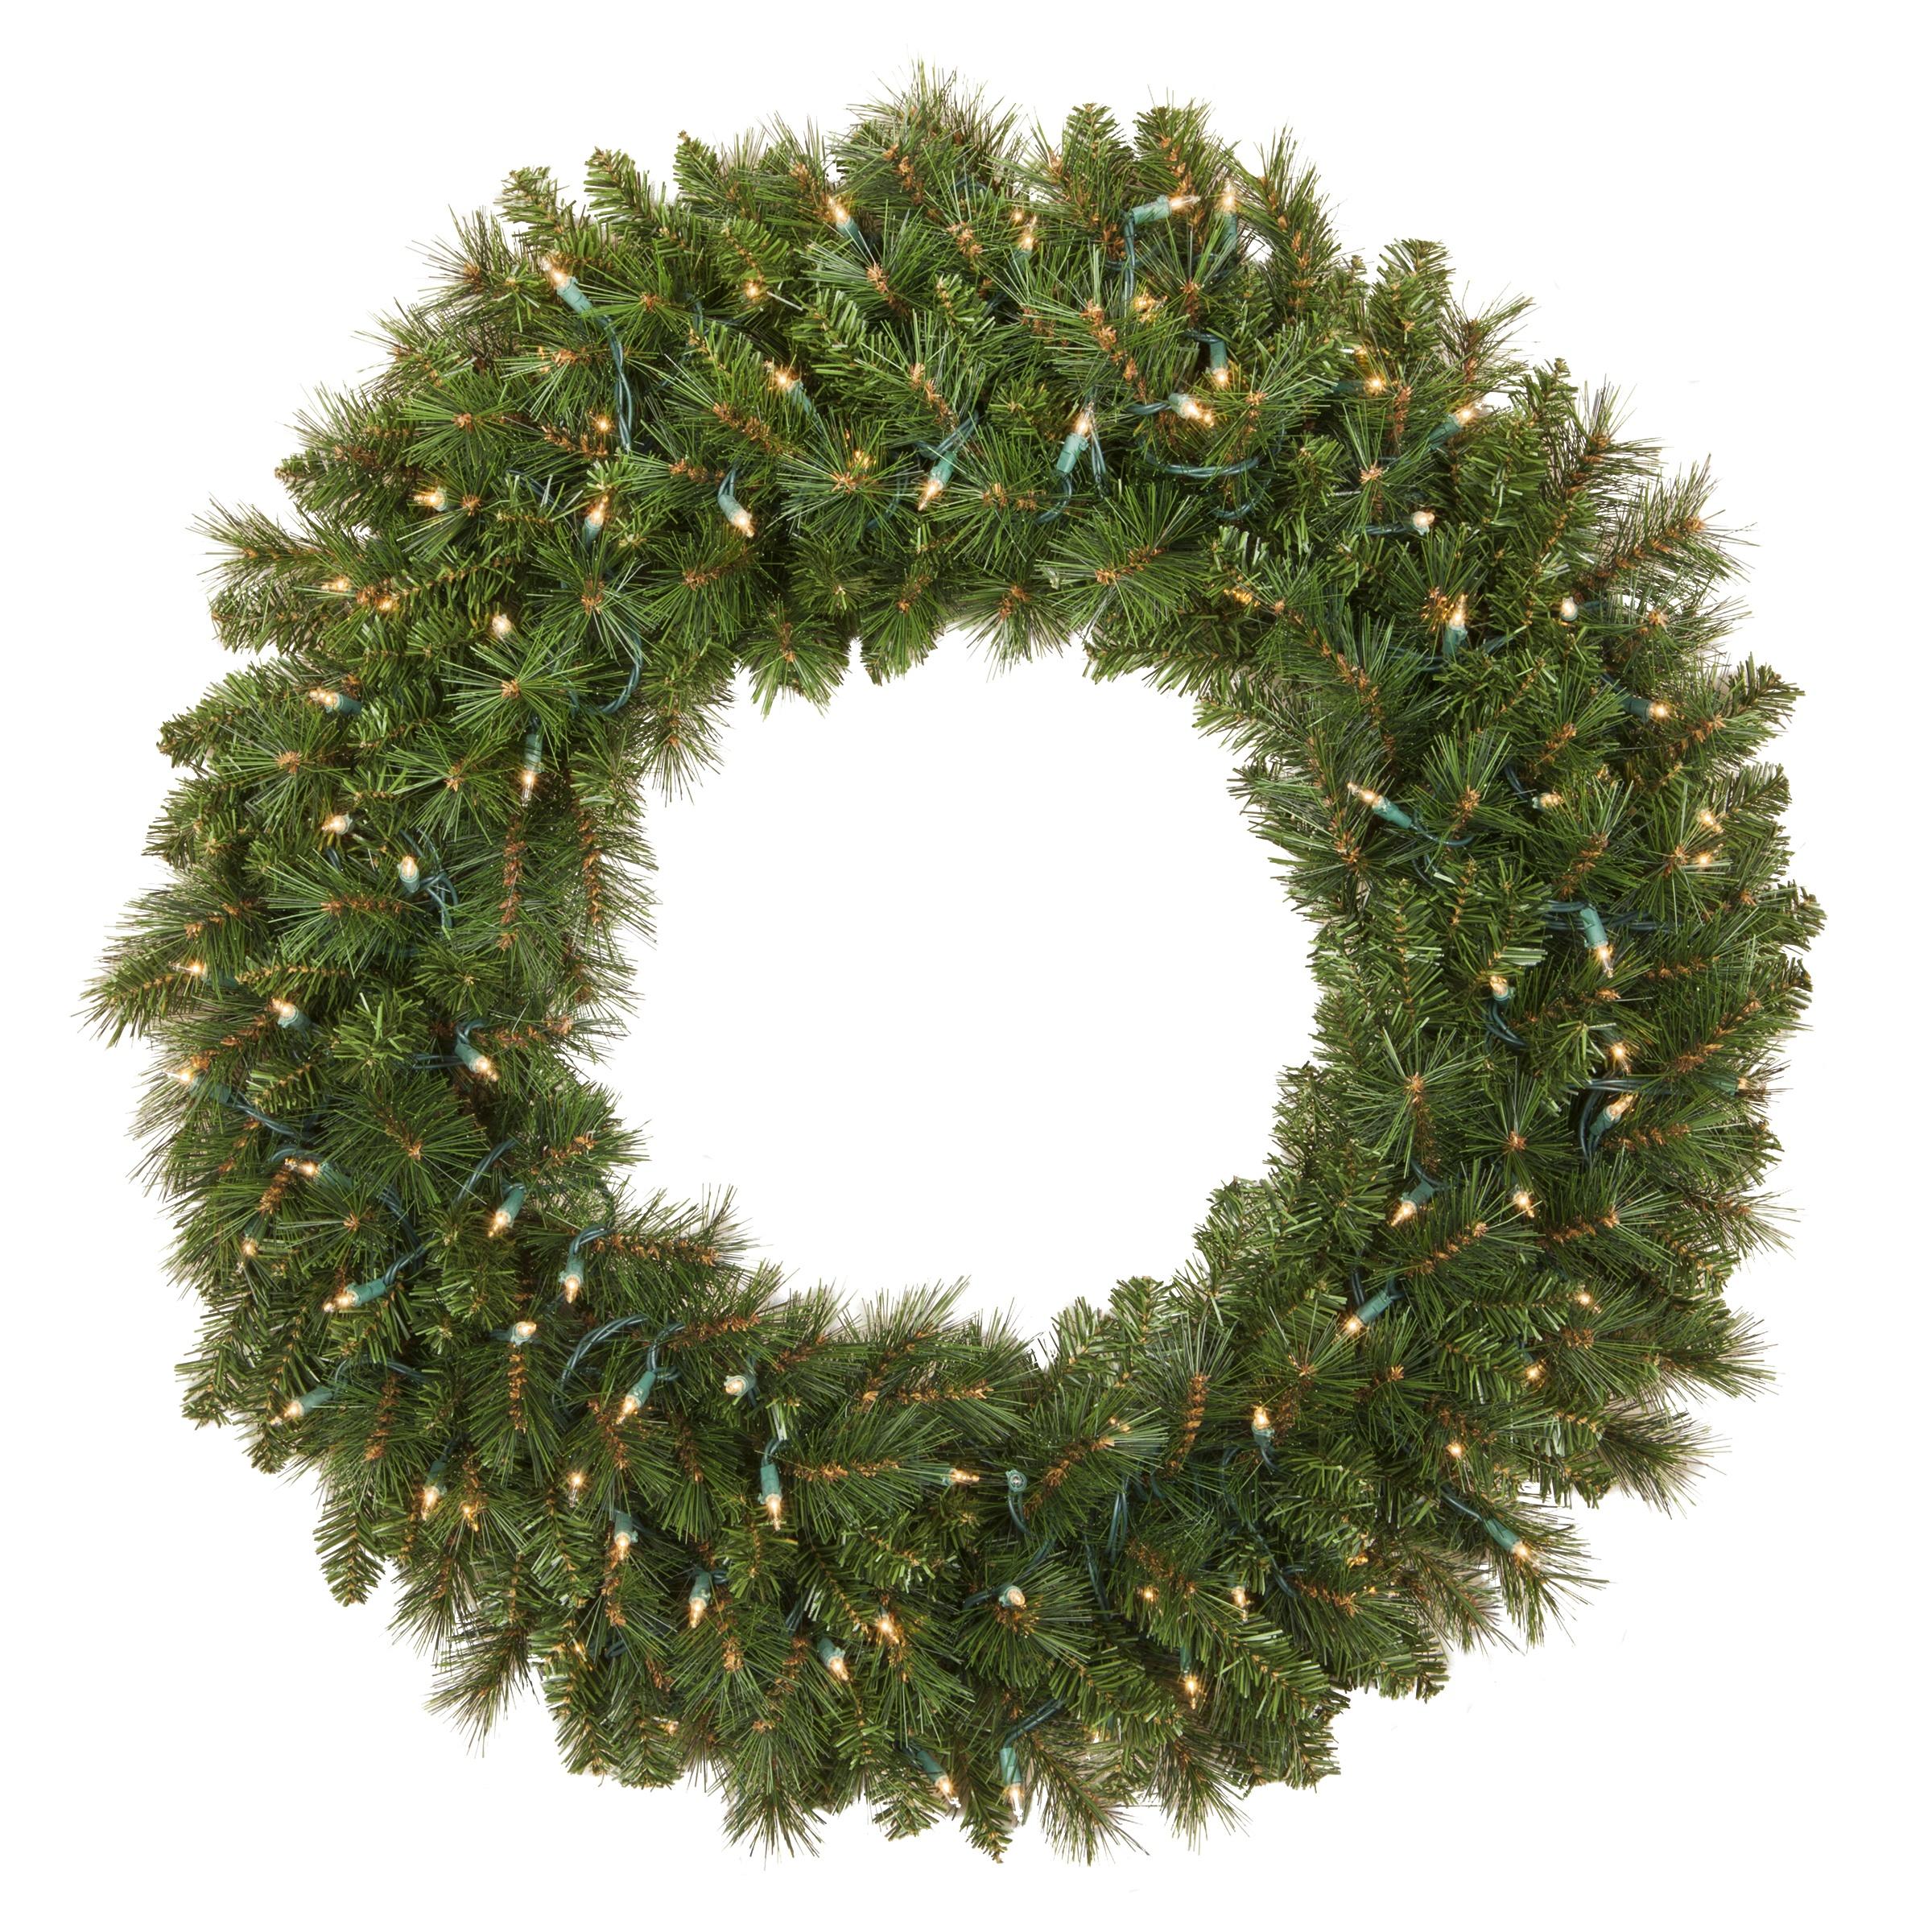 48 Inch Pre Lit Christmas Wreath